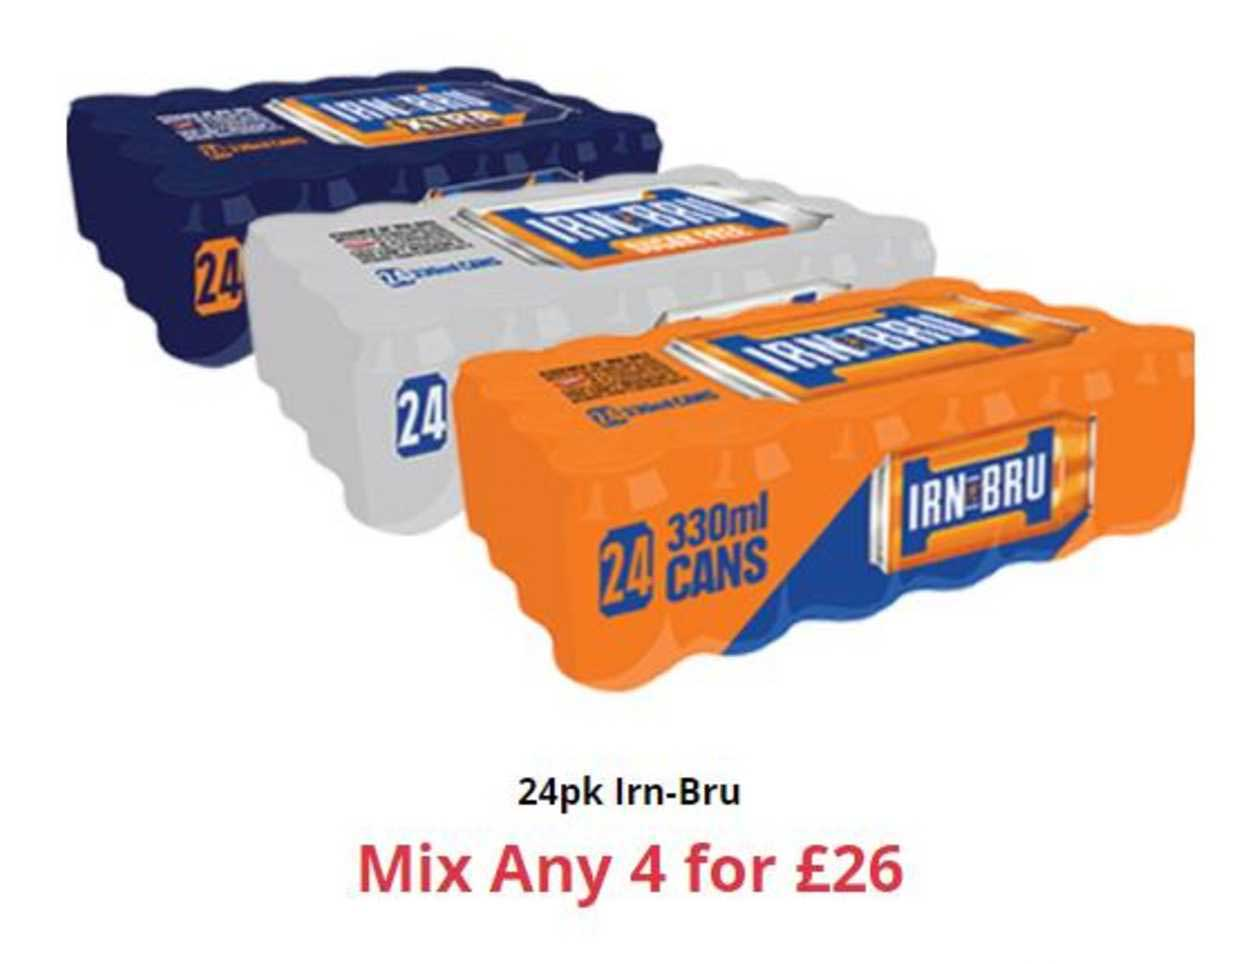 Farmfoods 24Pk Irn-Bru Mix Any 4